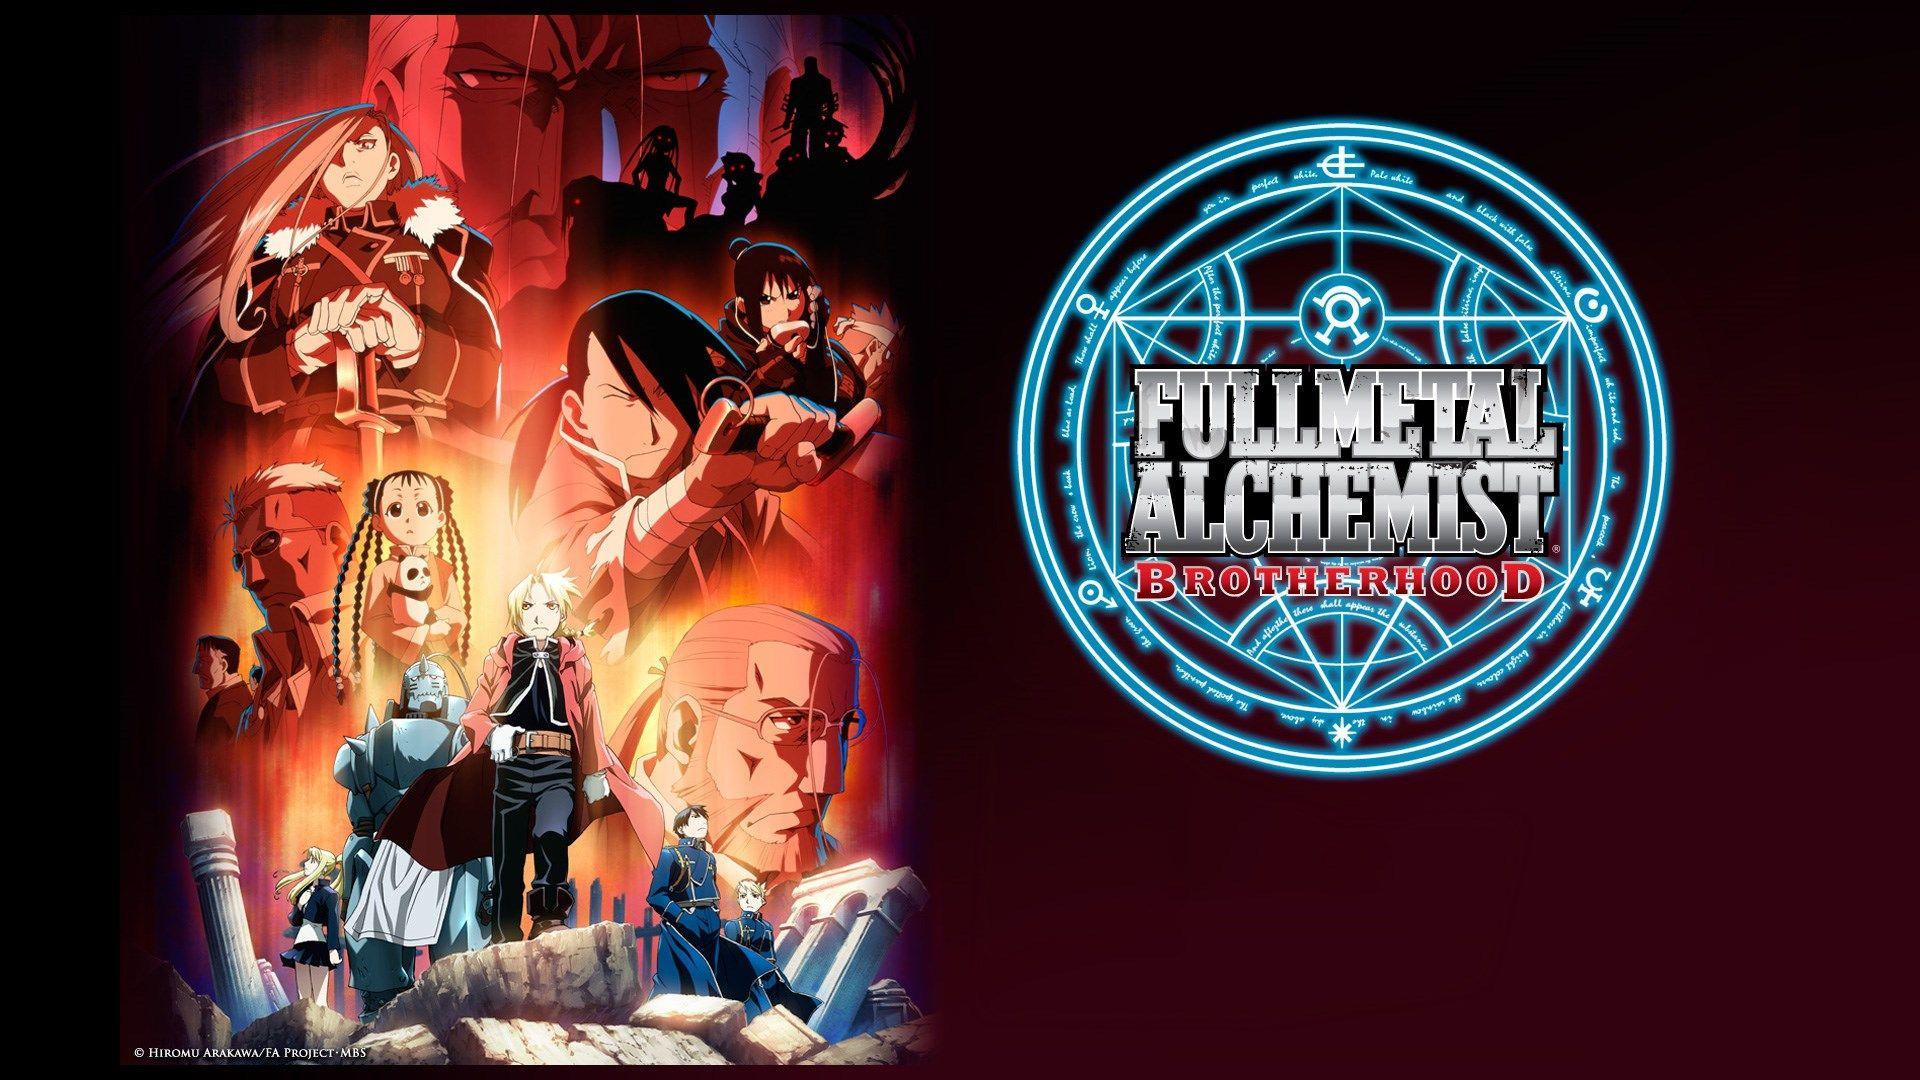 Fullmetal Alchemist Wallpaper Collection 1920x1080 Fullmetal Alchemist Fullmetal Alchemist Brotherhood Alchemist